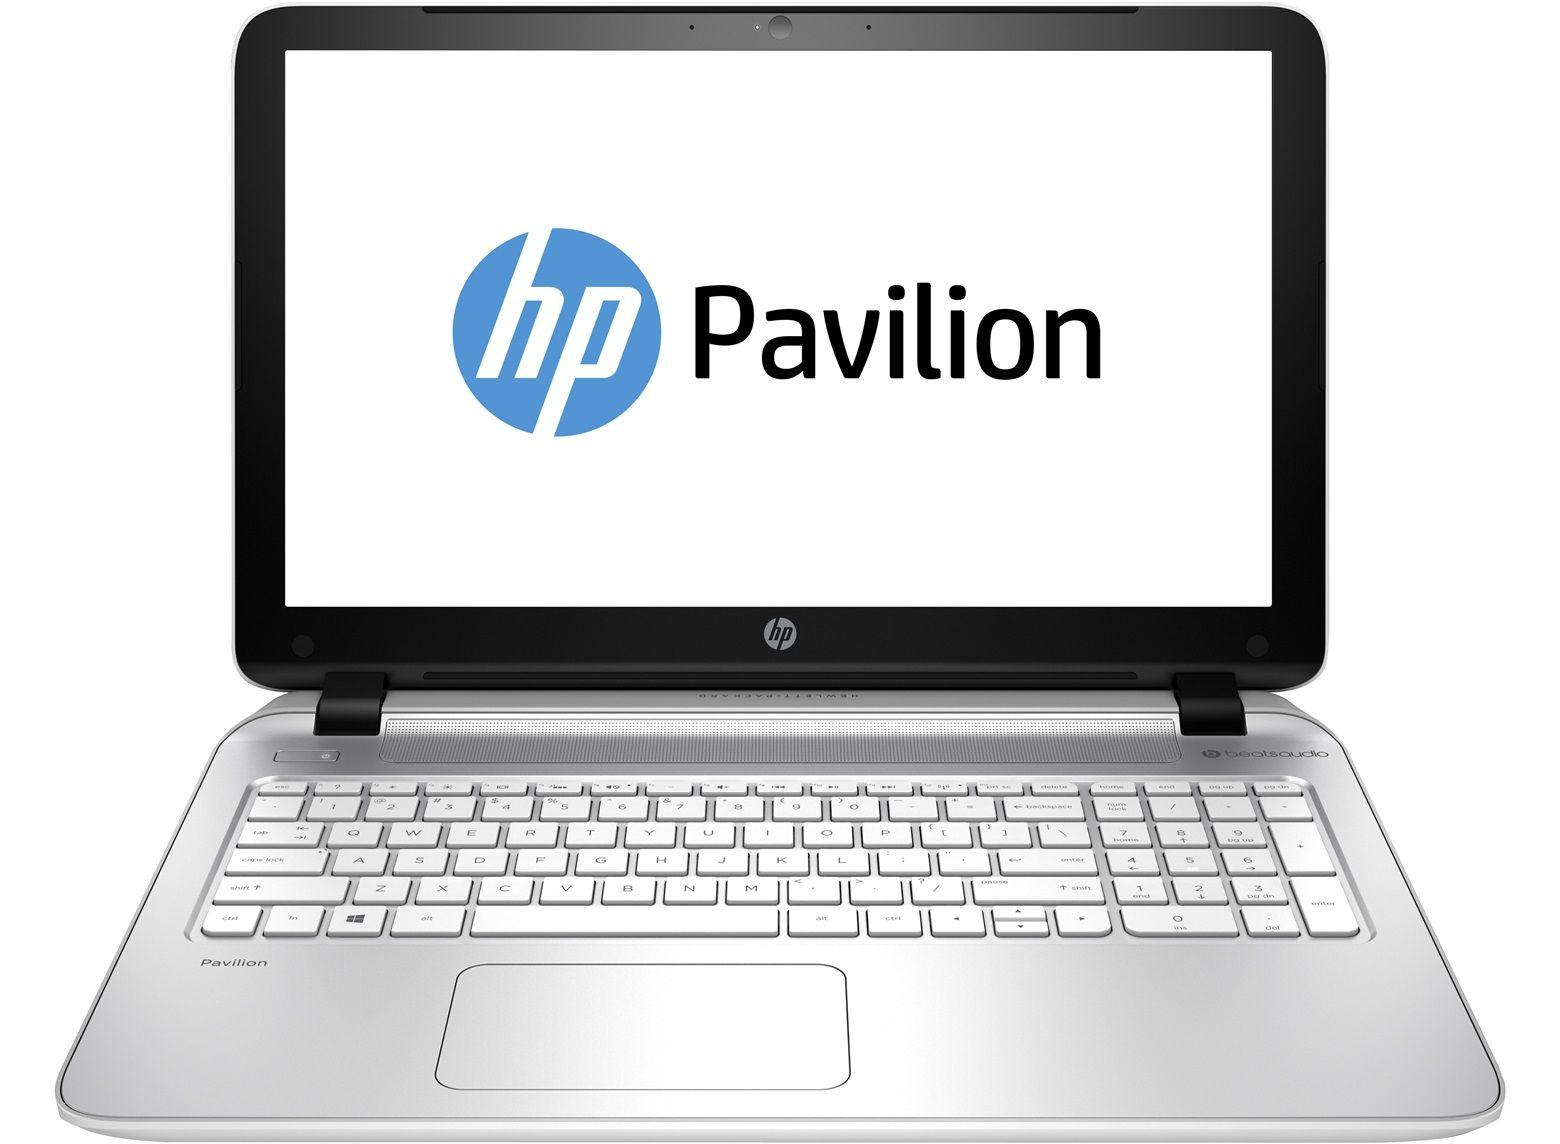 999 HP Pavilion 15p039ax Notebook PC (Snow White) HP